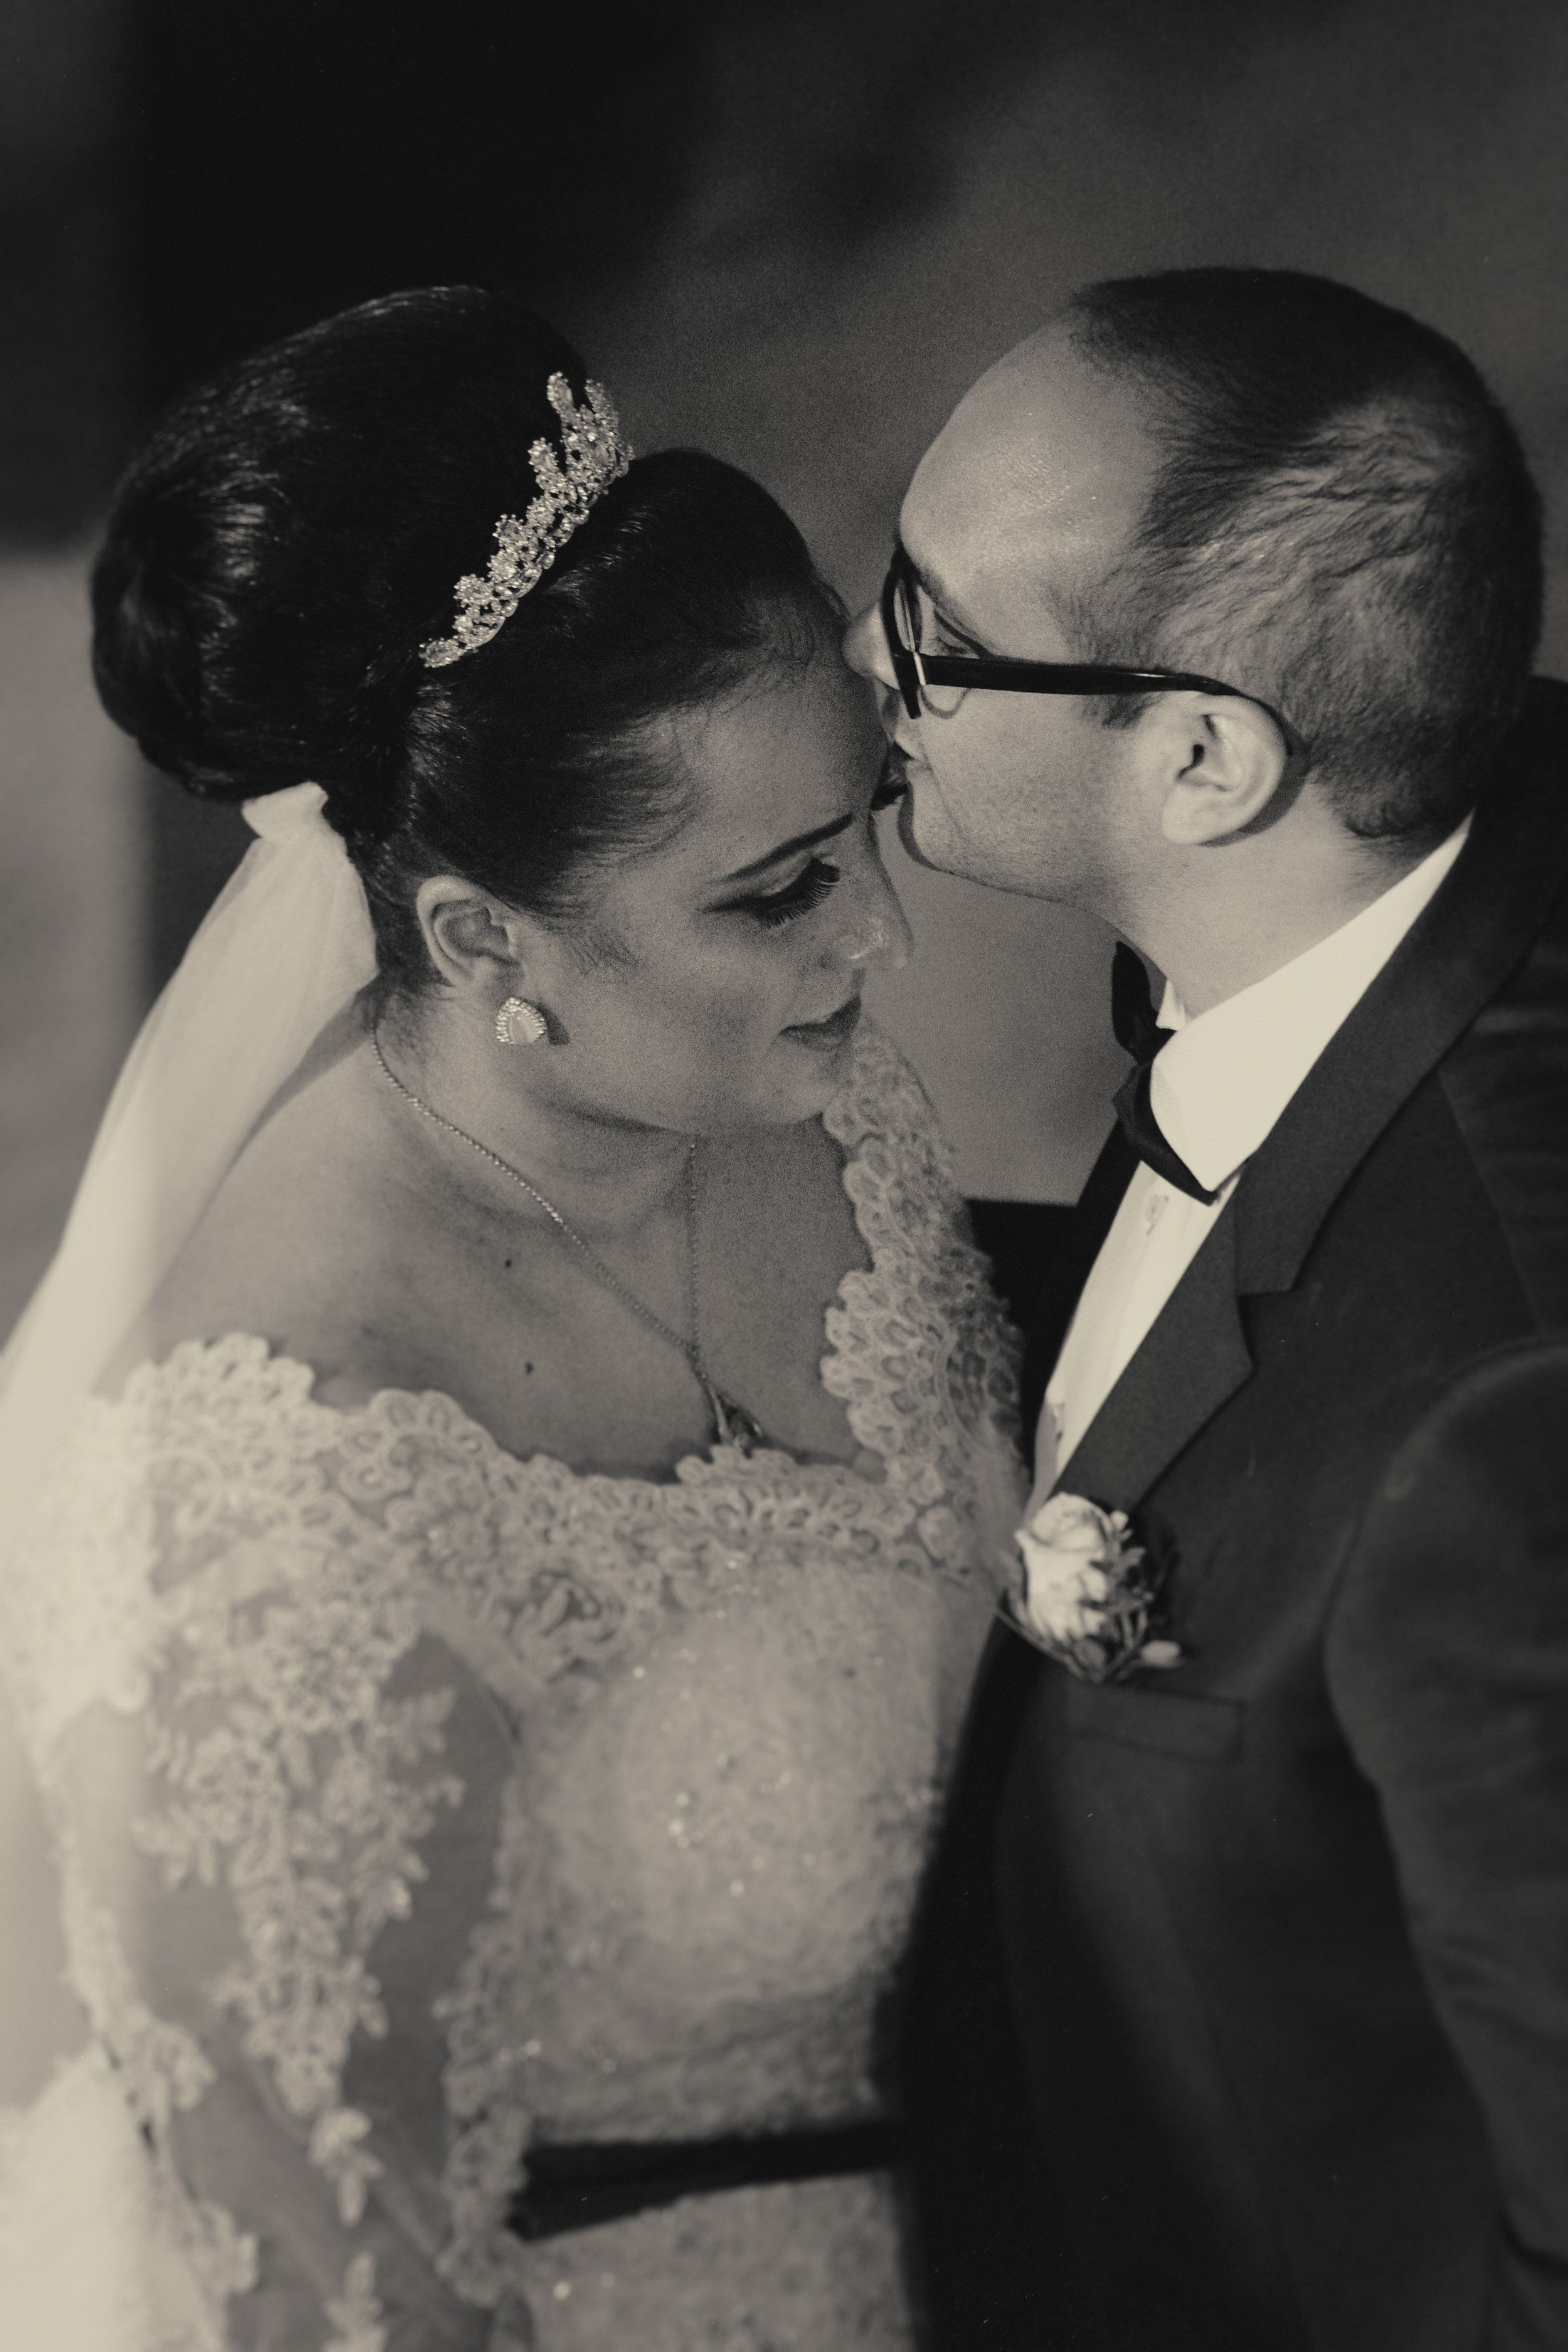 Wedding dresses crewe  ohne Worte emofotodoku EmoFotoDokuOberammergauHochzeit